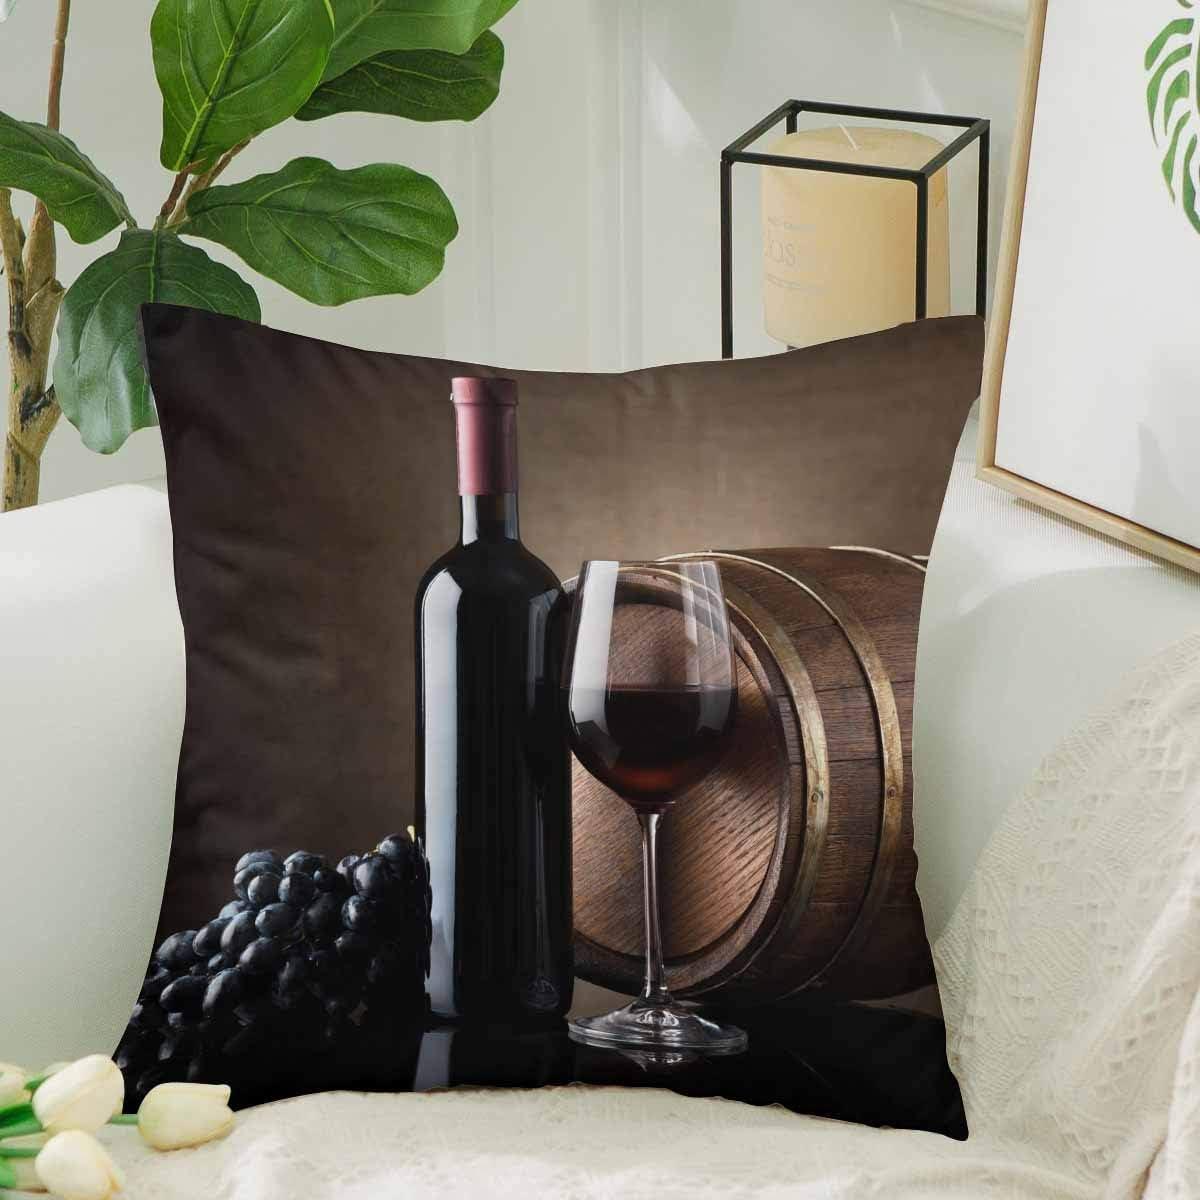 Kinhevao Divertidas Uvas de Botella de Vino Tinto y cojín ...